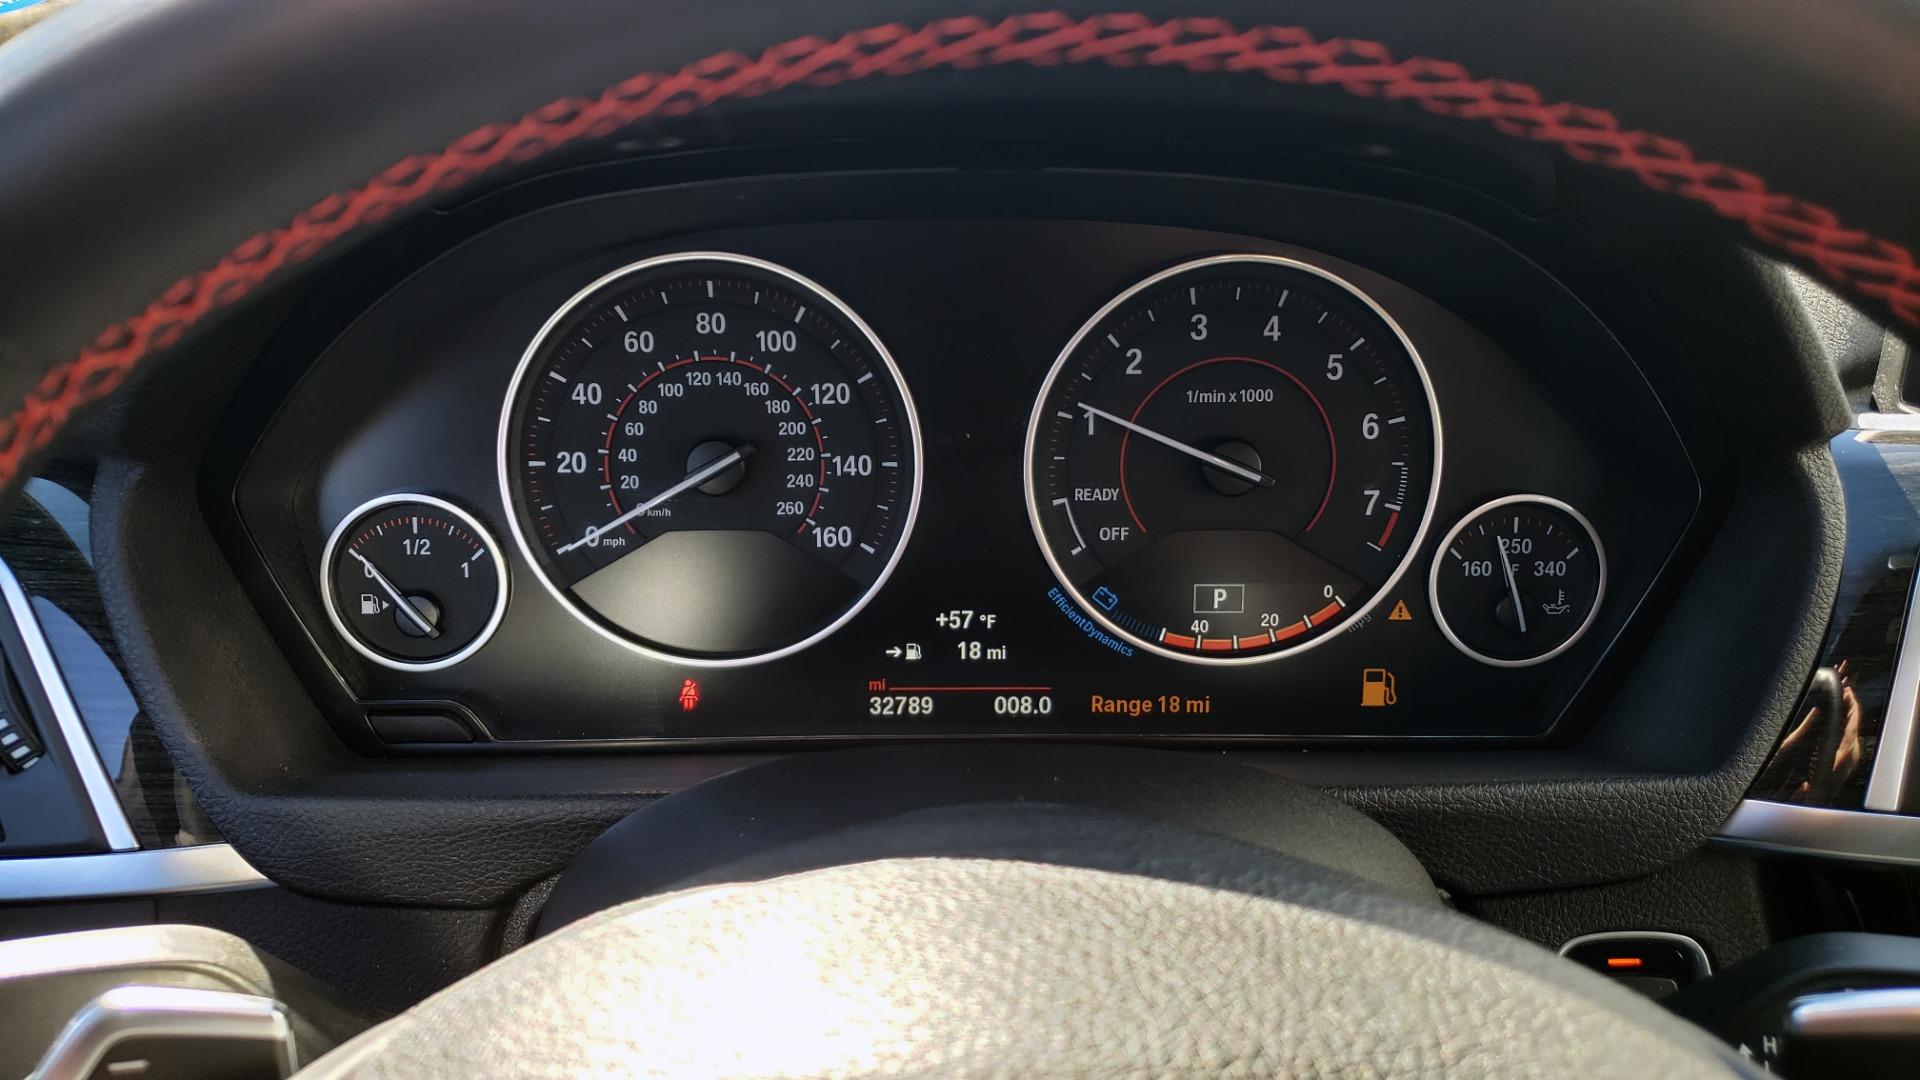 Used 2018 BMW 4 SERIES 430IXDRIVE / PREMIUM / NAV / SUNROOF / ESSENTIALS PKG for sale $28,995 at Formula Imports in Charlotte NC 28227 40